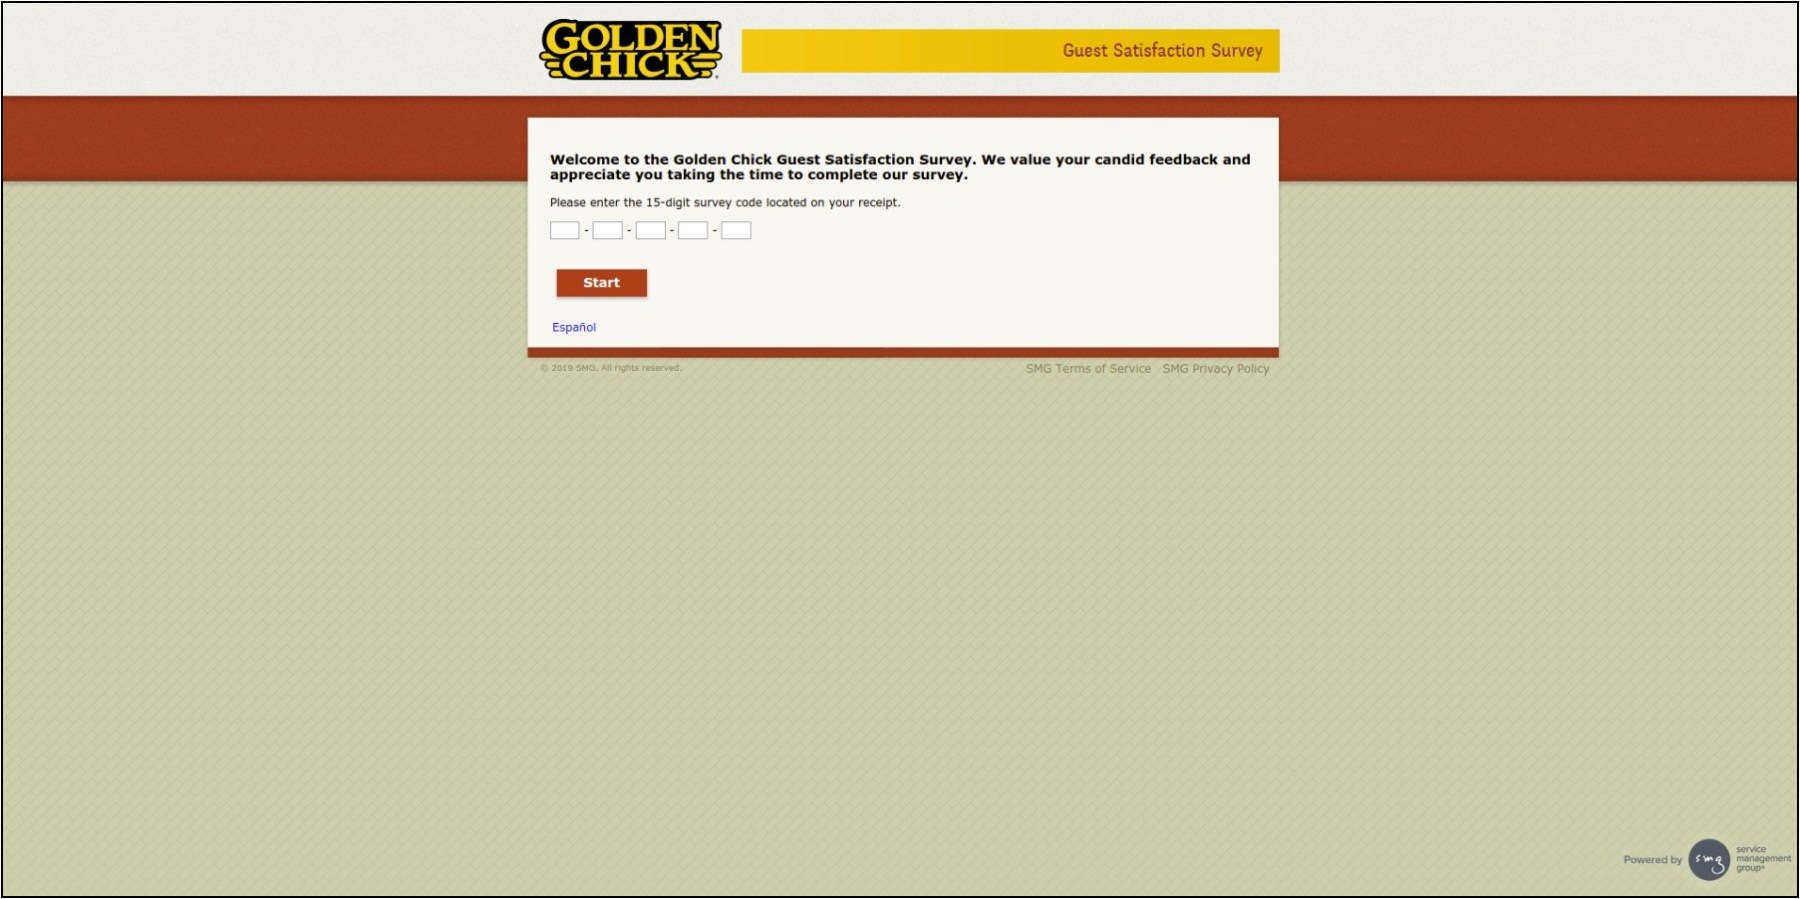 www.GoldenChickSurvey.com